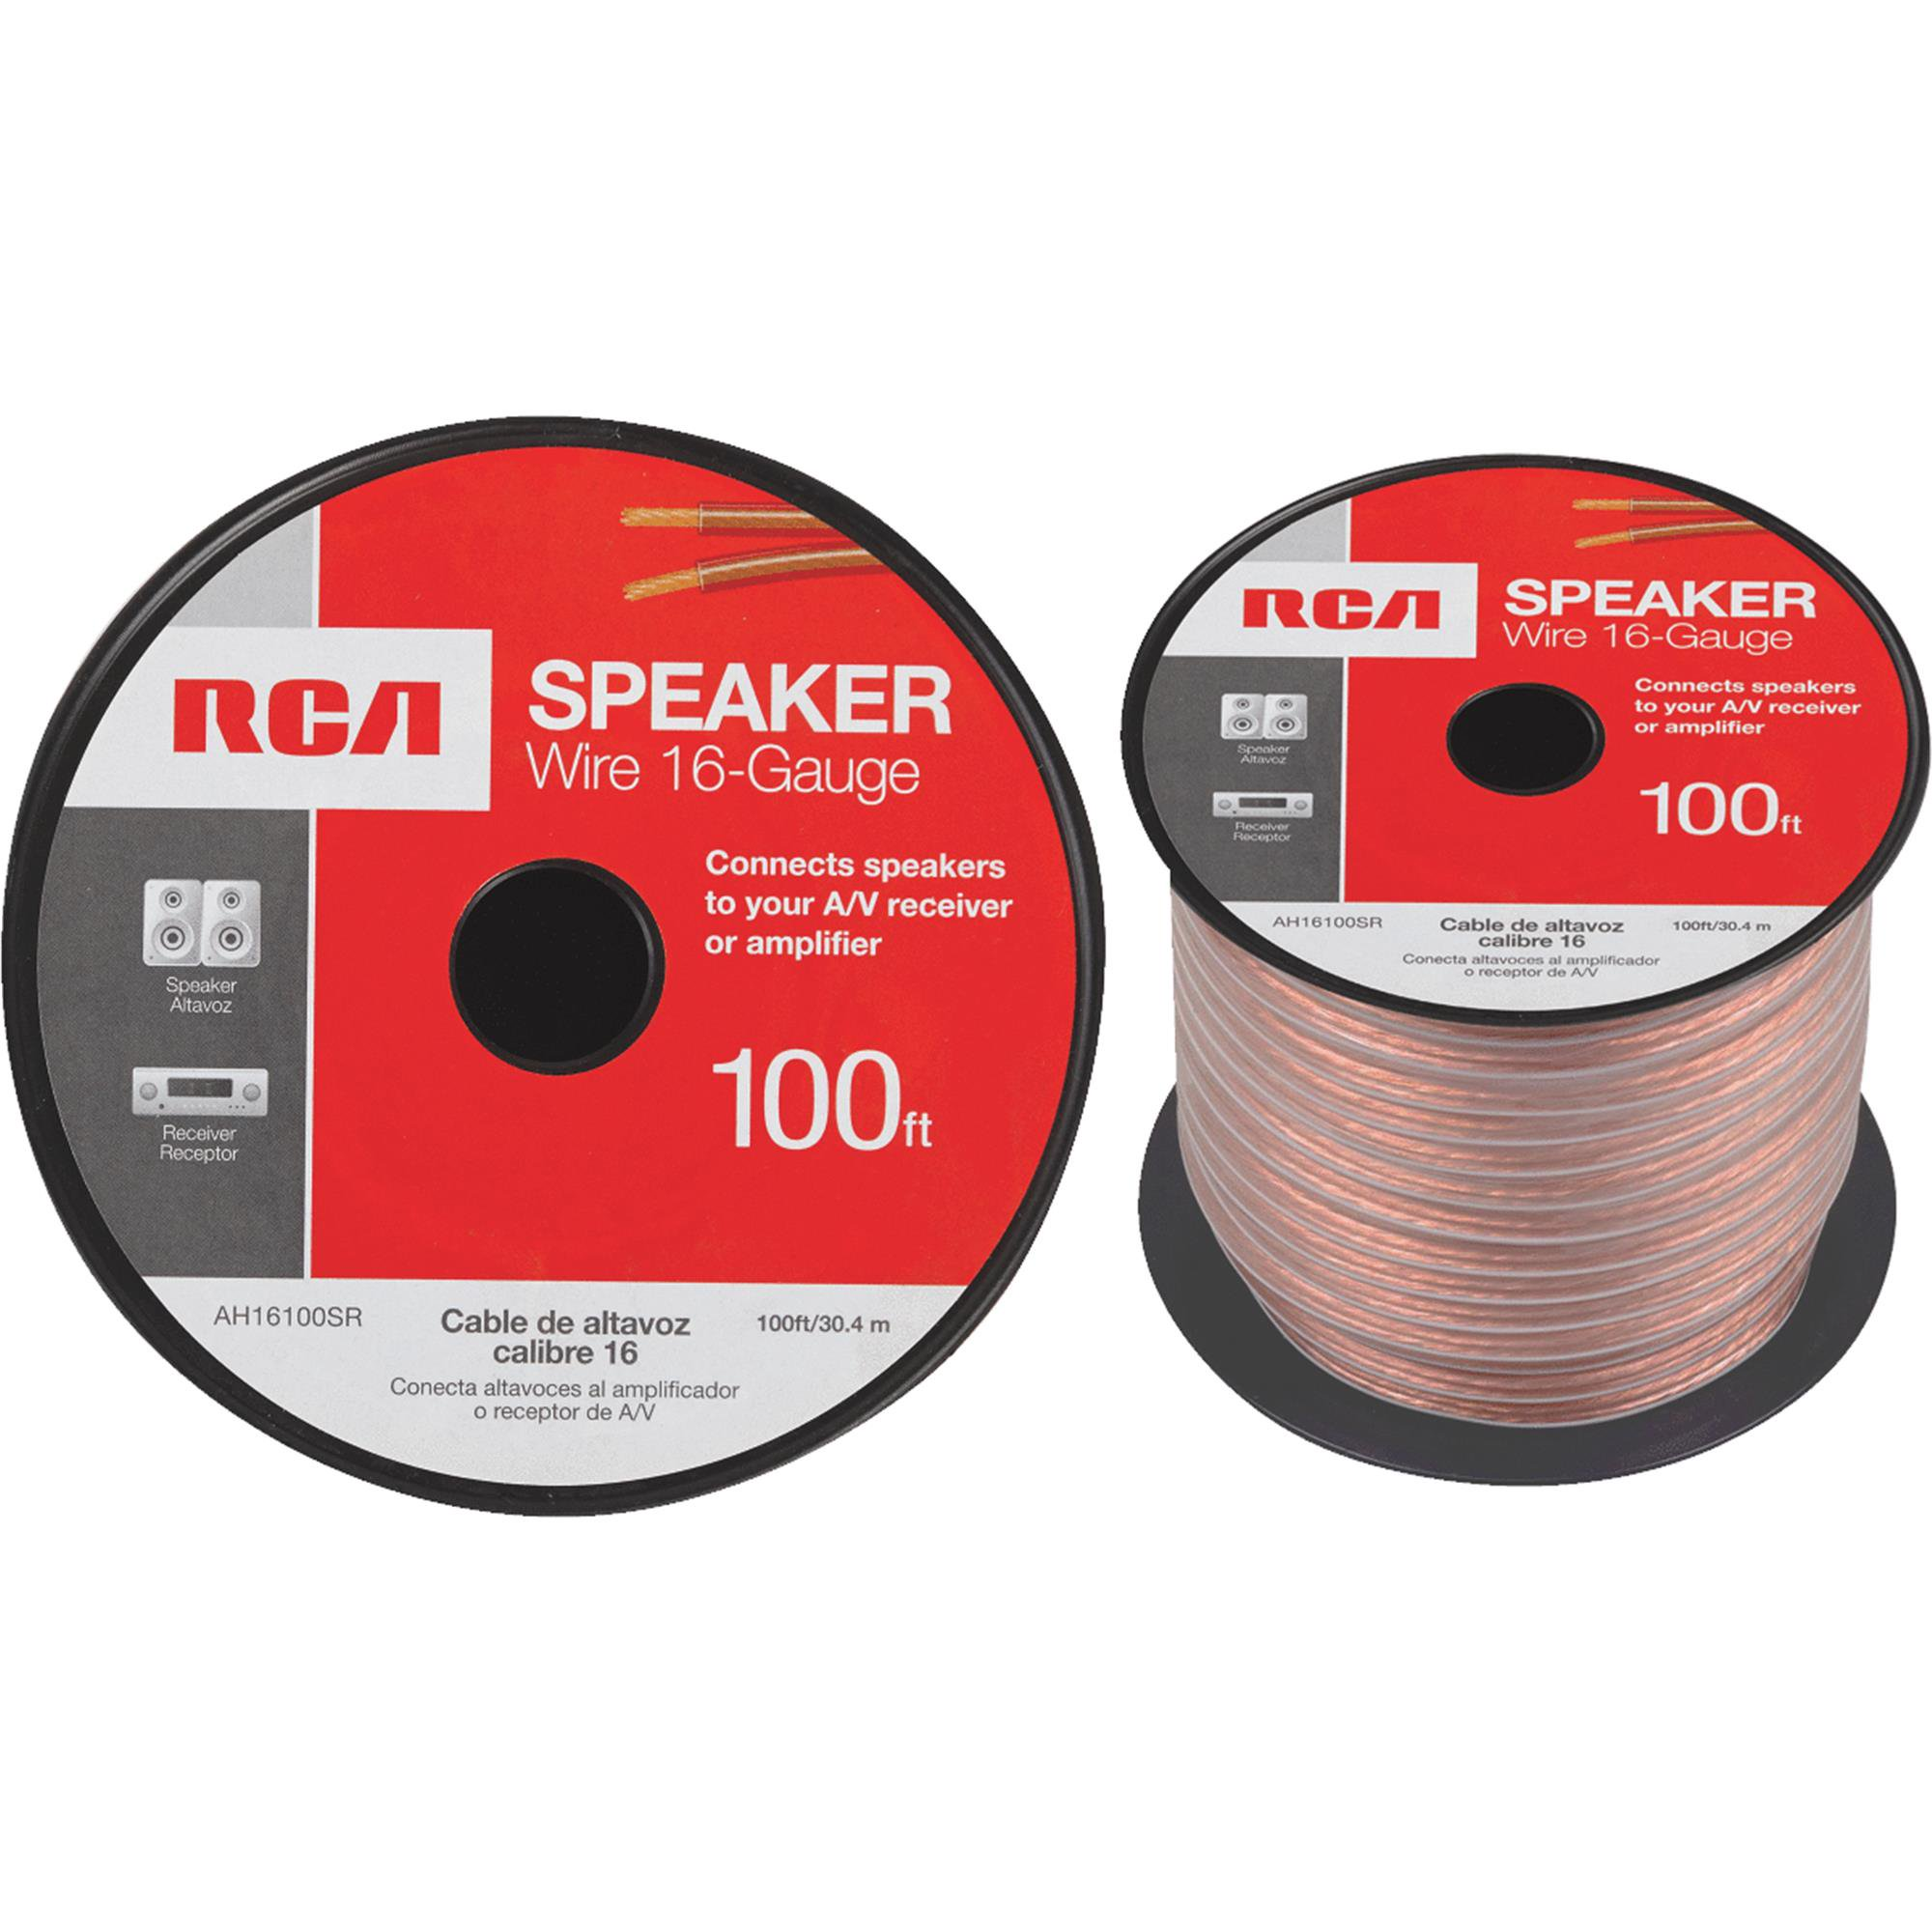 RCA 16-Gauge Speaker Wire, 100'